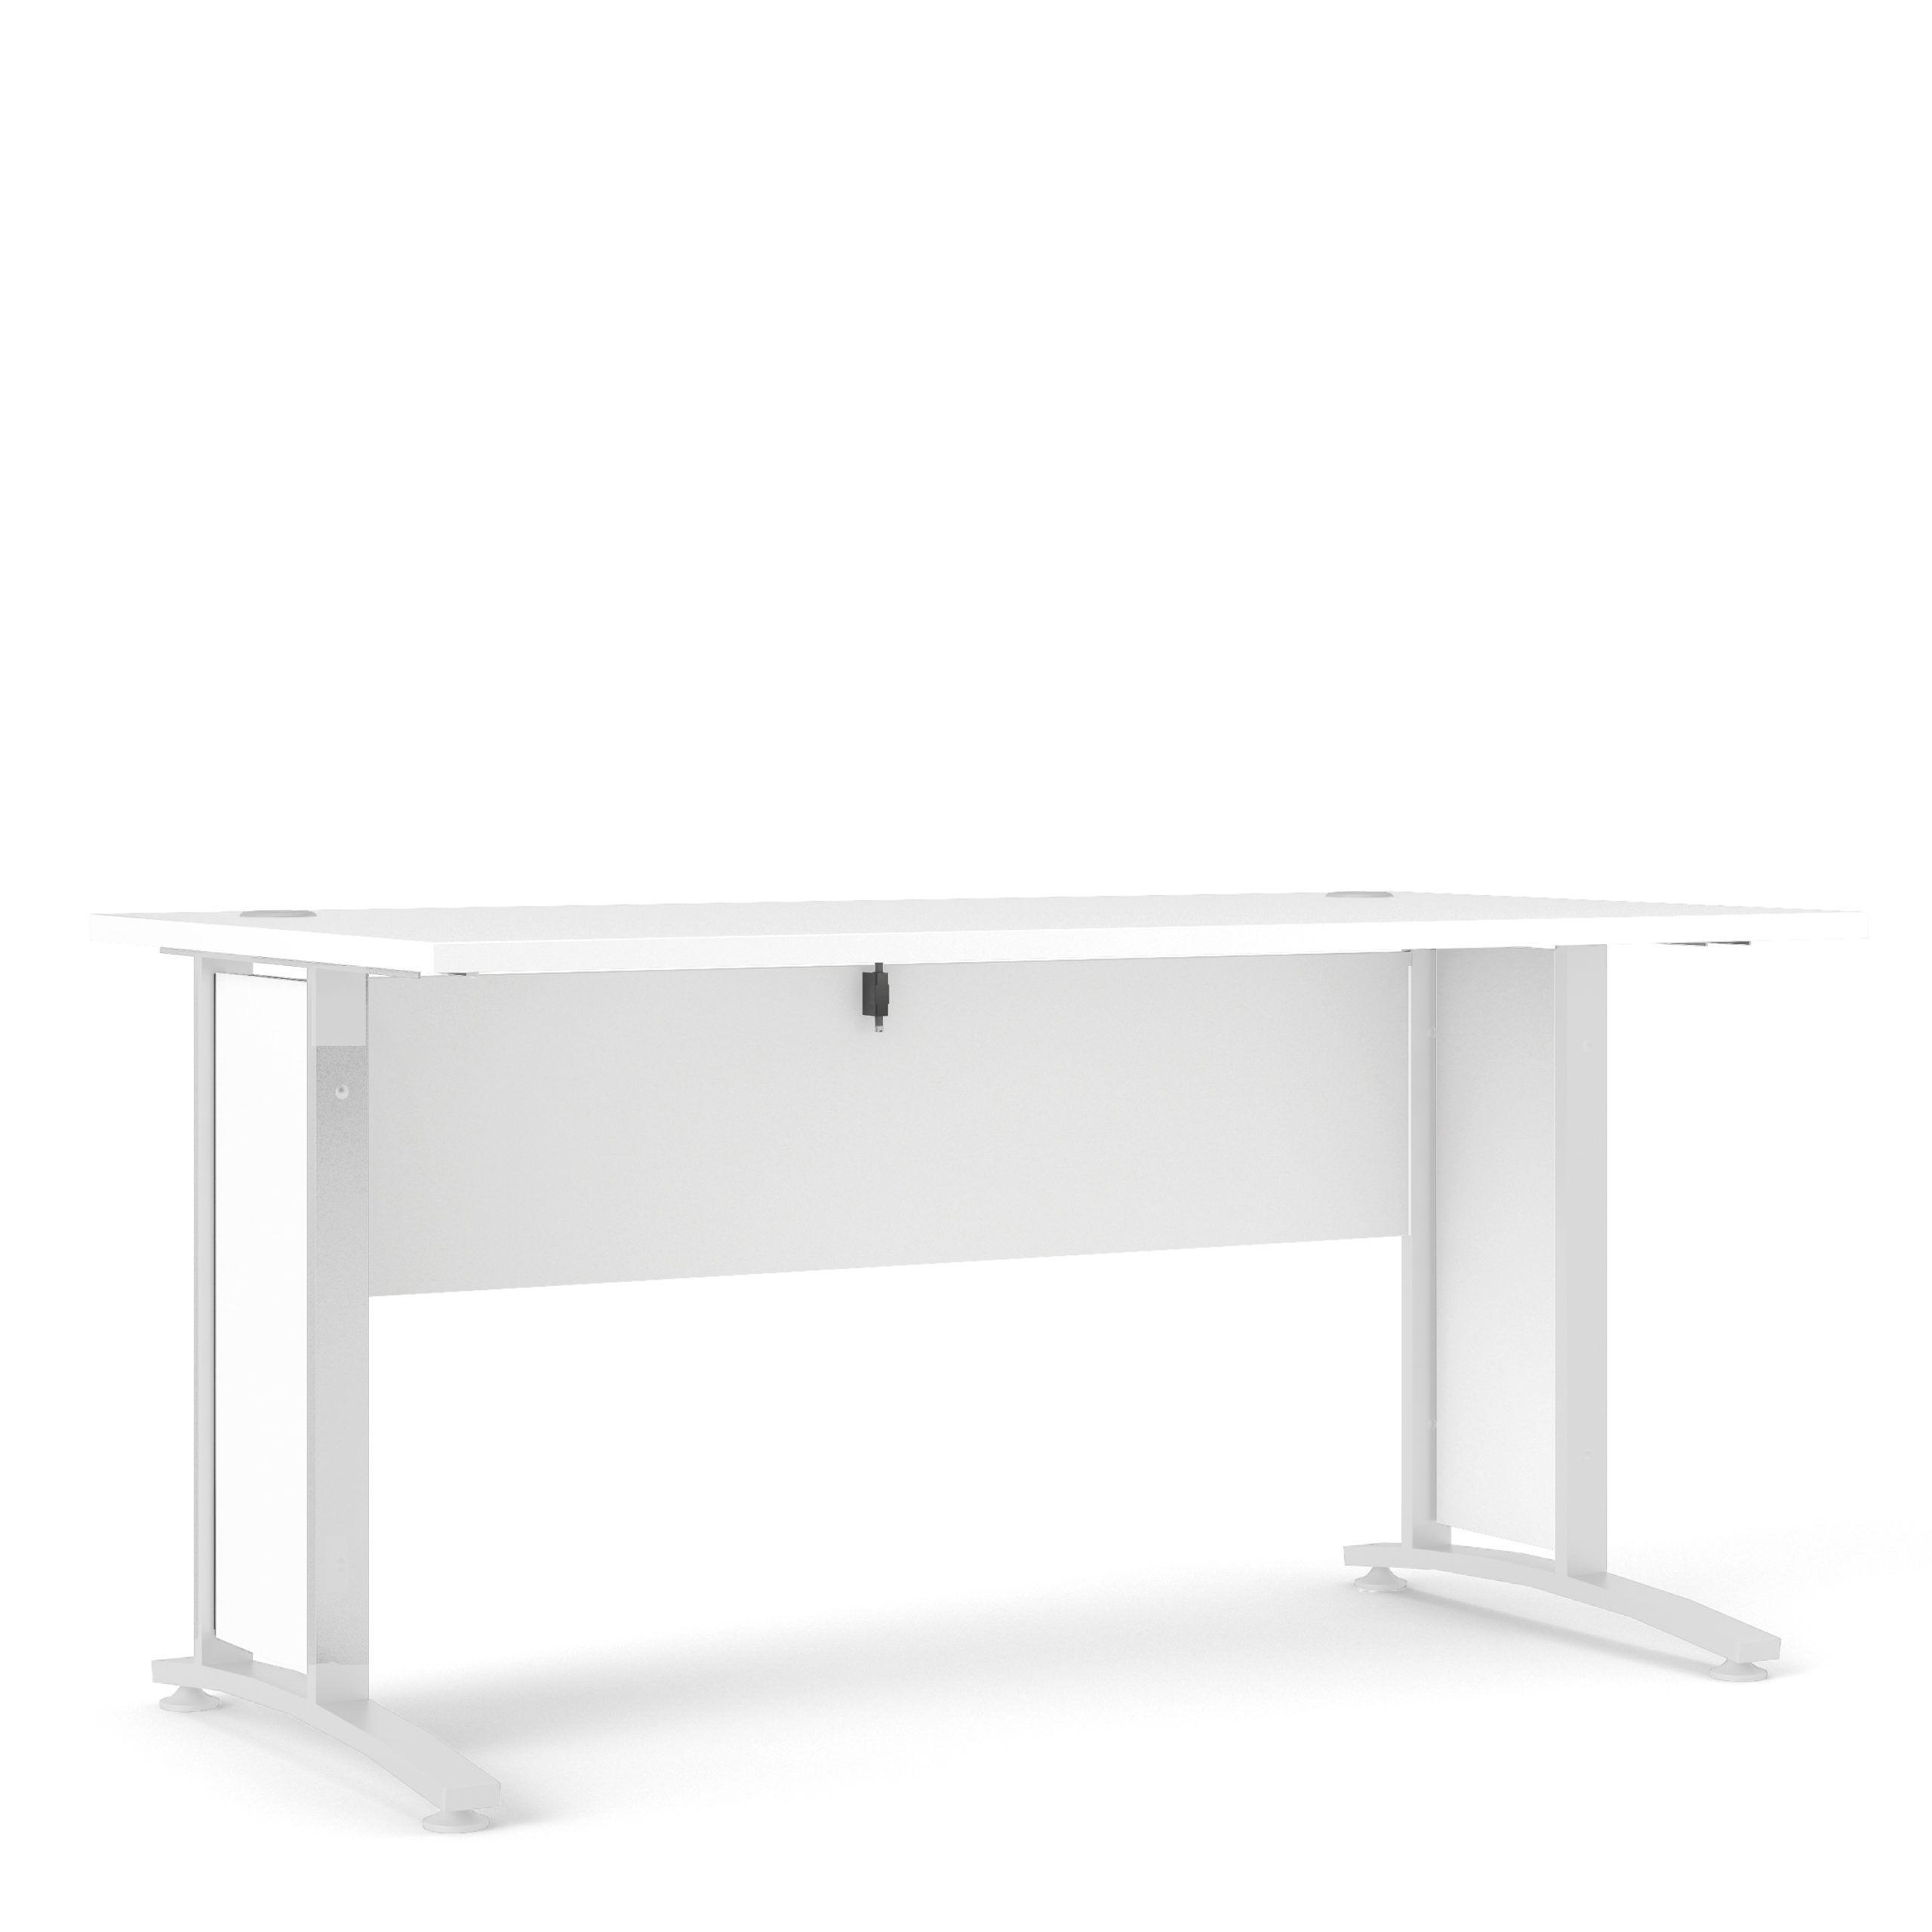 Kansas Desk 150 cm in White with White legs   Self Assembly